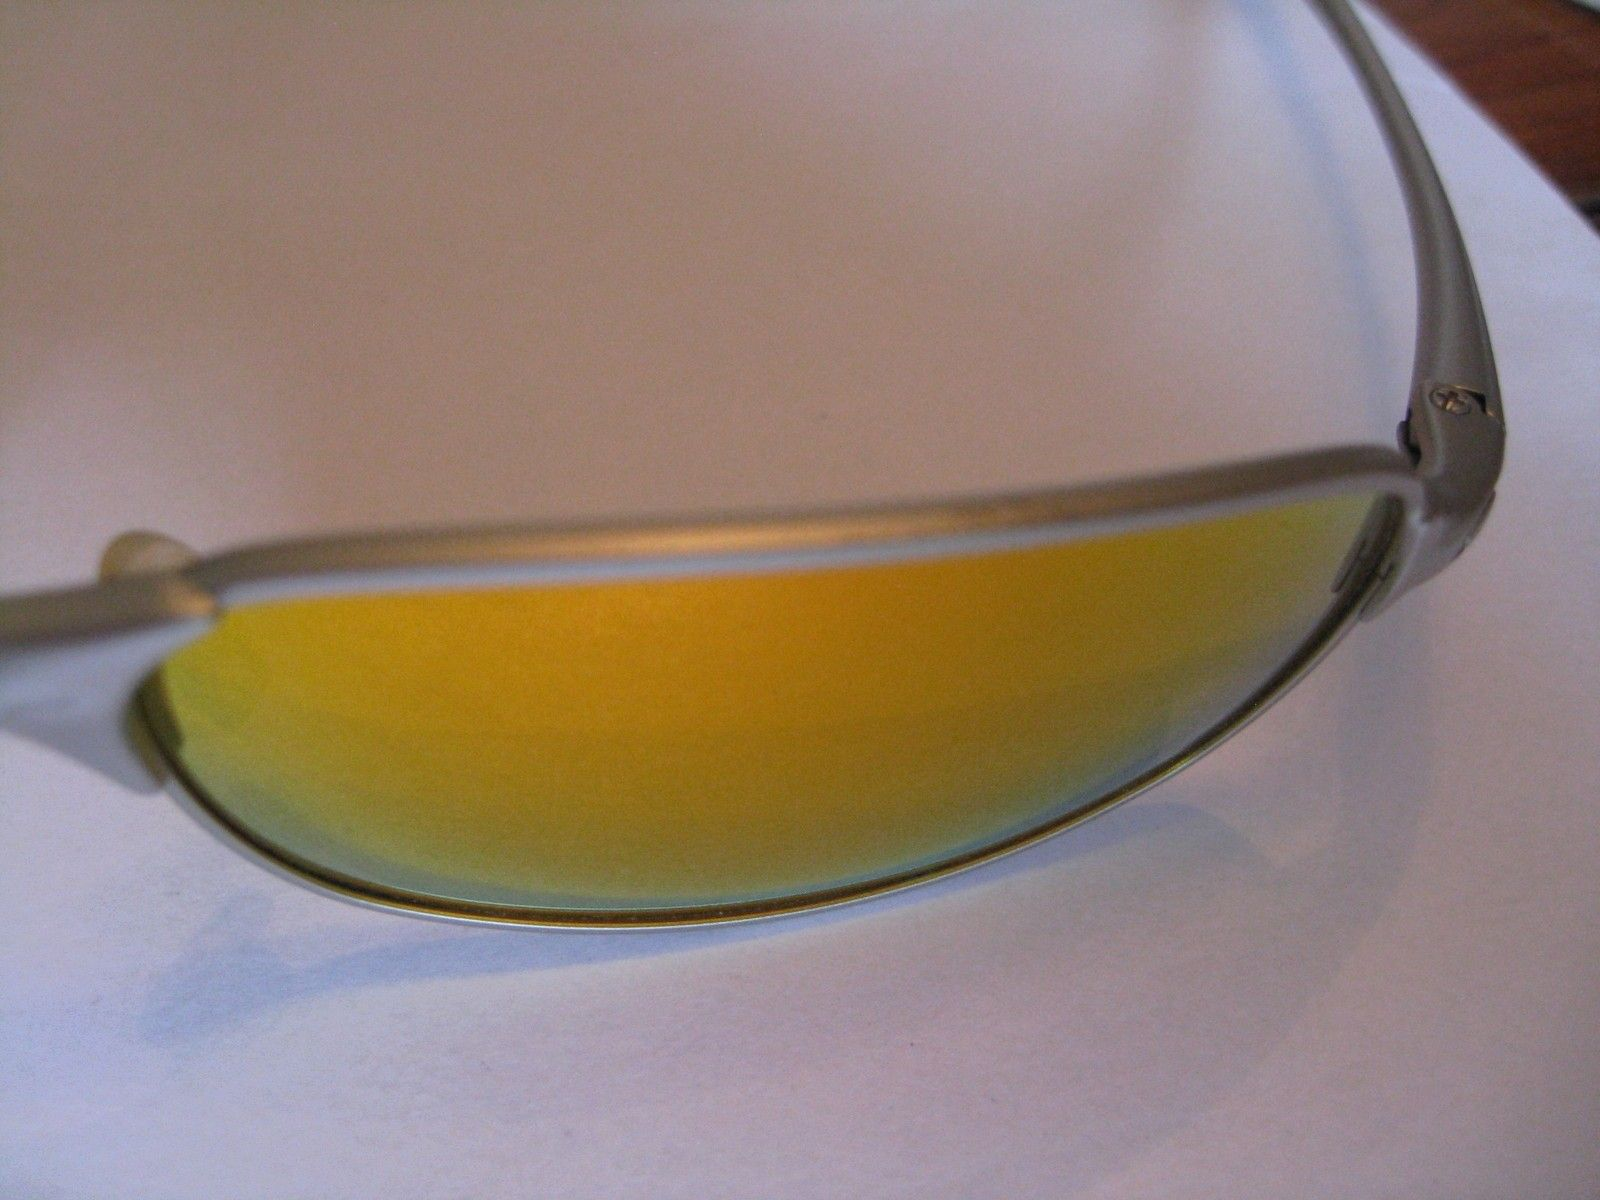 Oakley Square Wire 2.0 Spring Hinge - Silver/Fire Iridium - 6wKRfEo.jpg